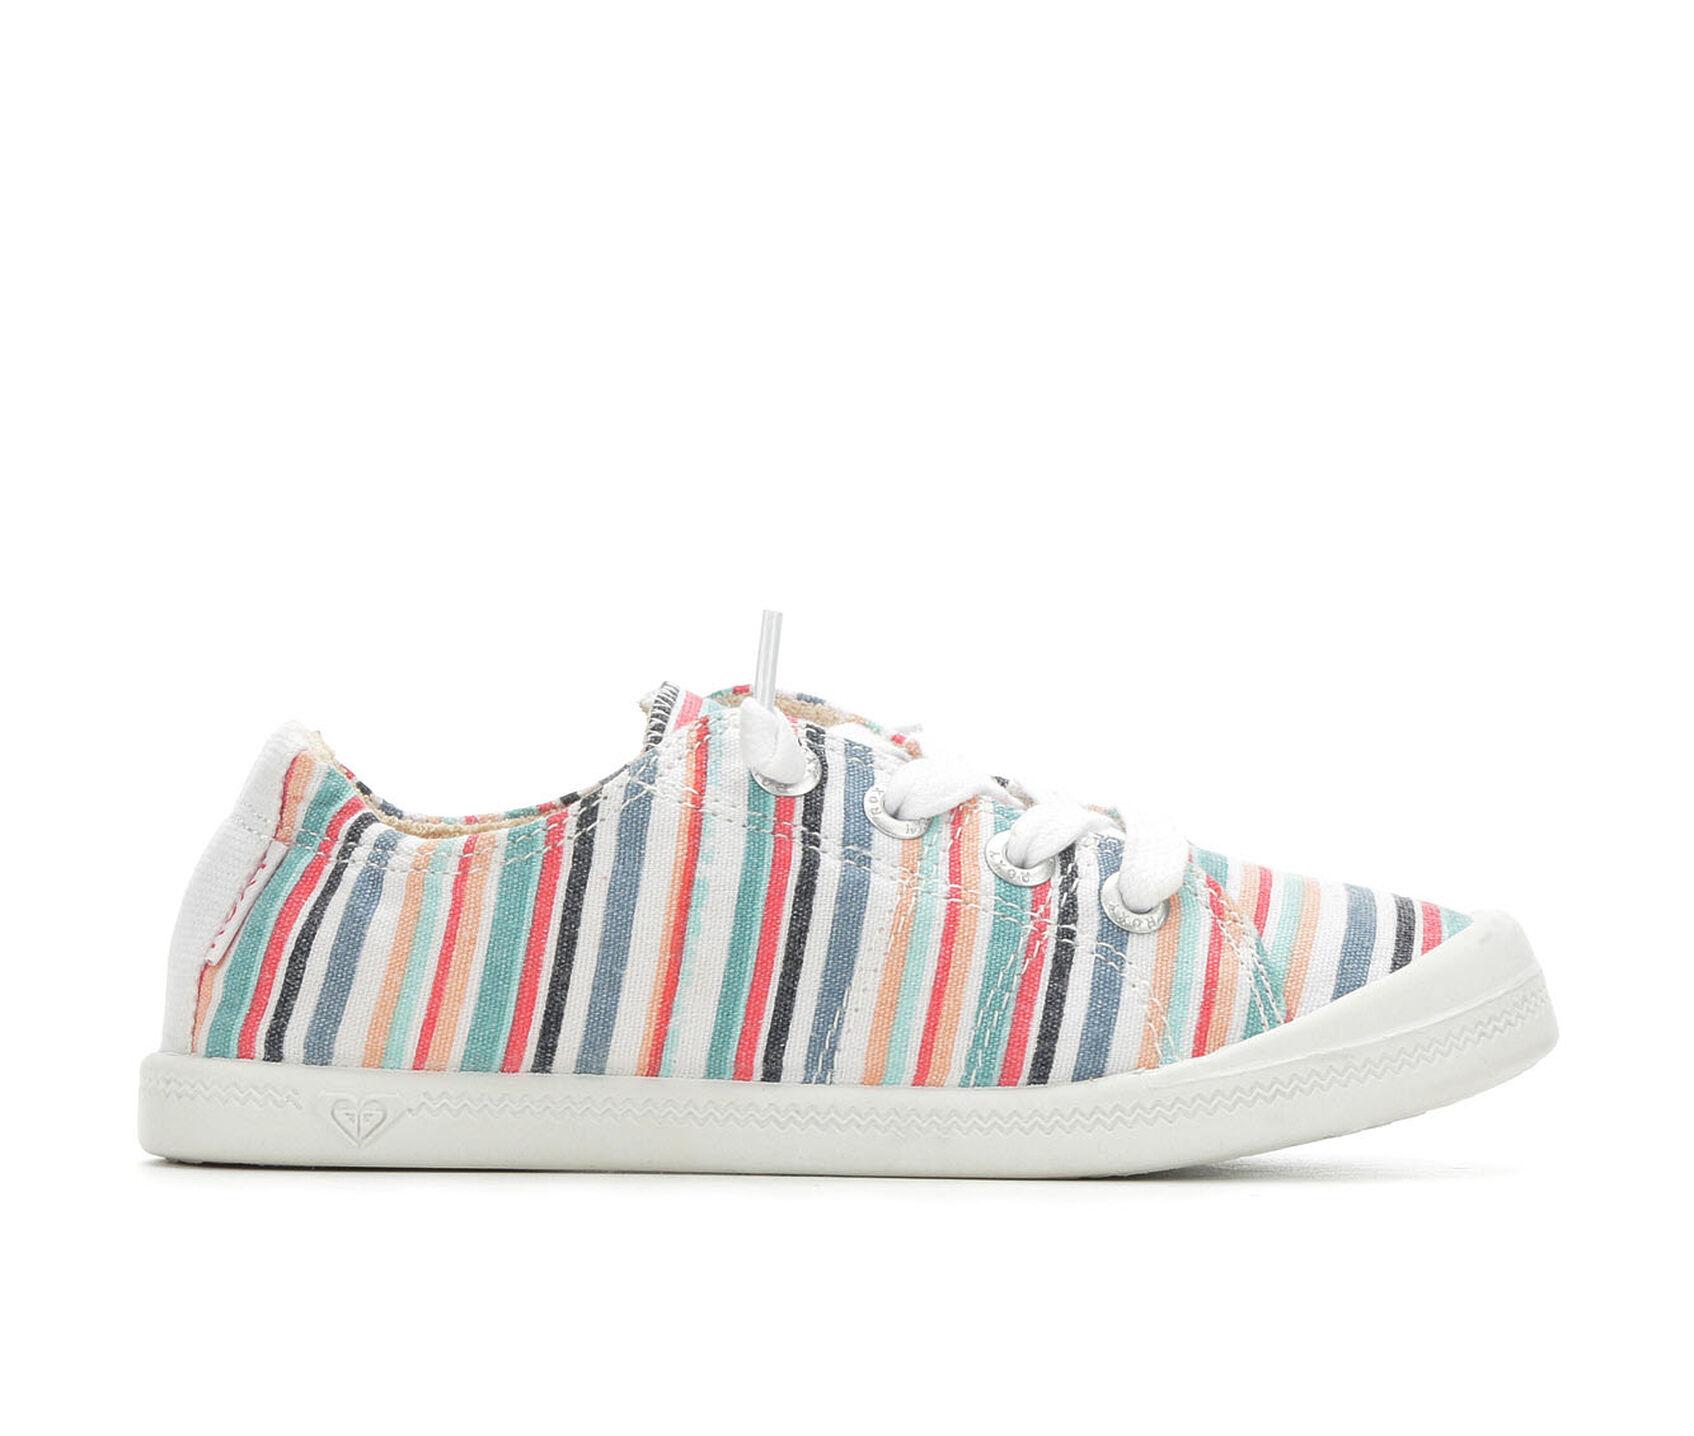 be0ae56c2c22 Girls  Roxy Little Kid   Big Kid Bayshore III Sneakers